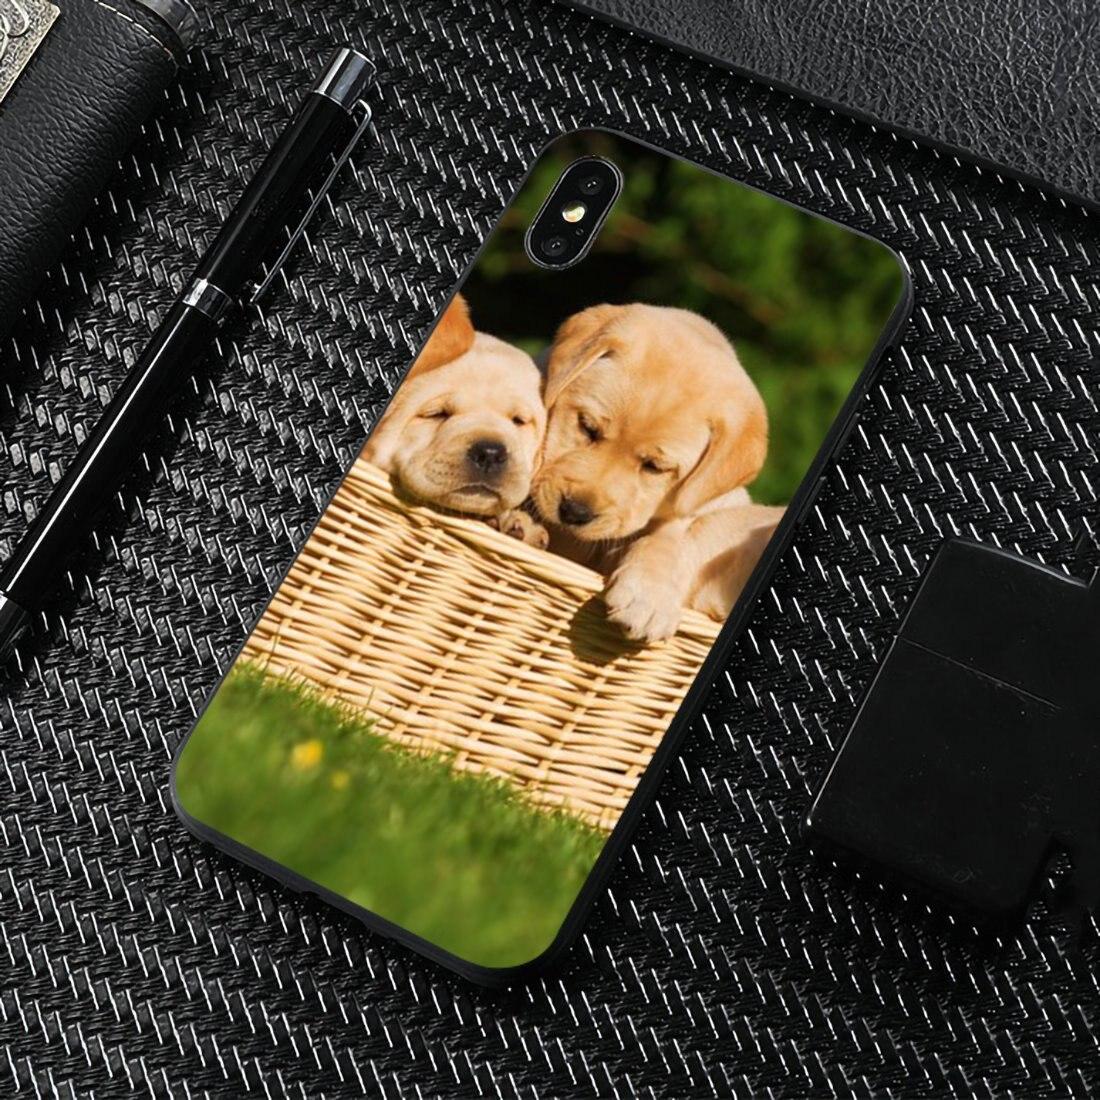 Para ZTE Blade A520 A512 A452 A602 A5 2019 V6 V7 V8 V9 V10 Lite Viat funda de teléfono de silicona de lujo perro cachorro labrador